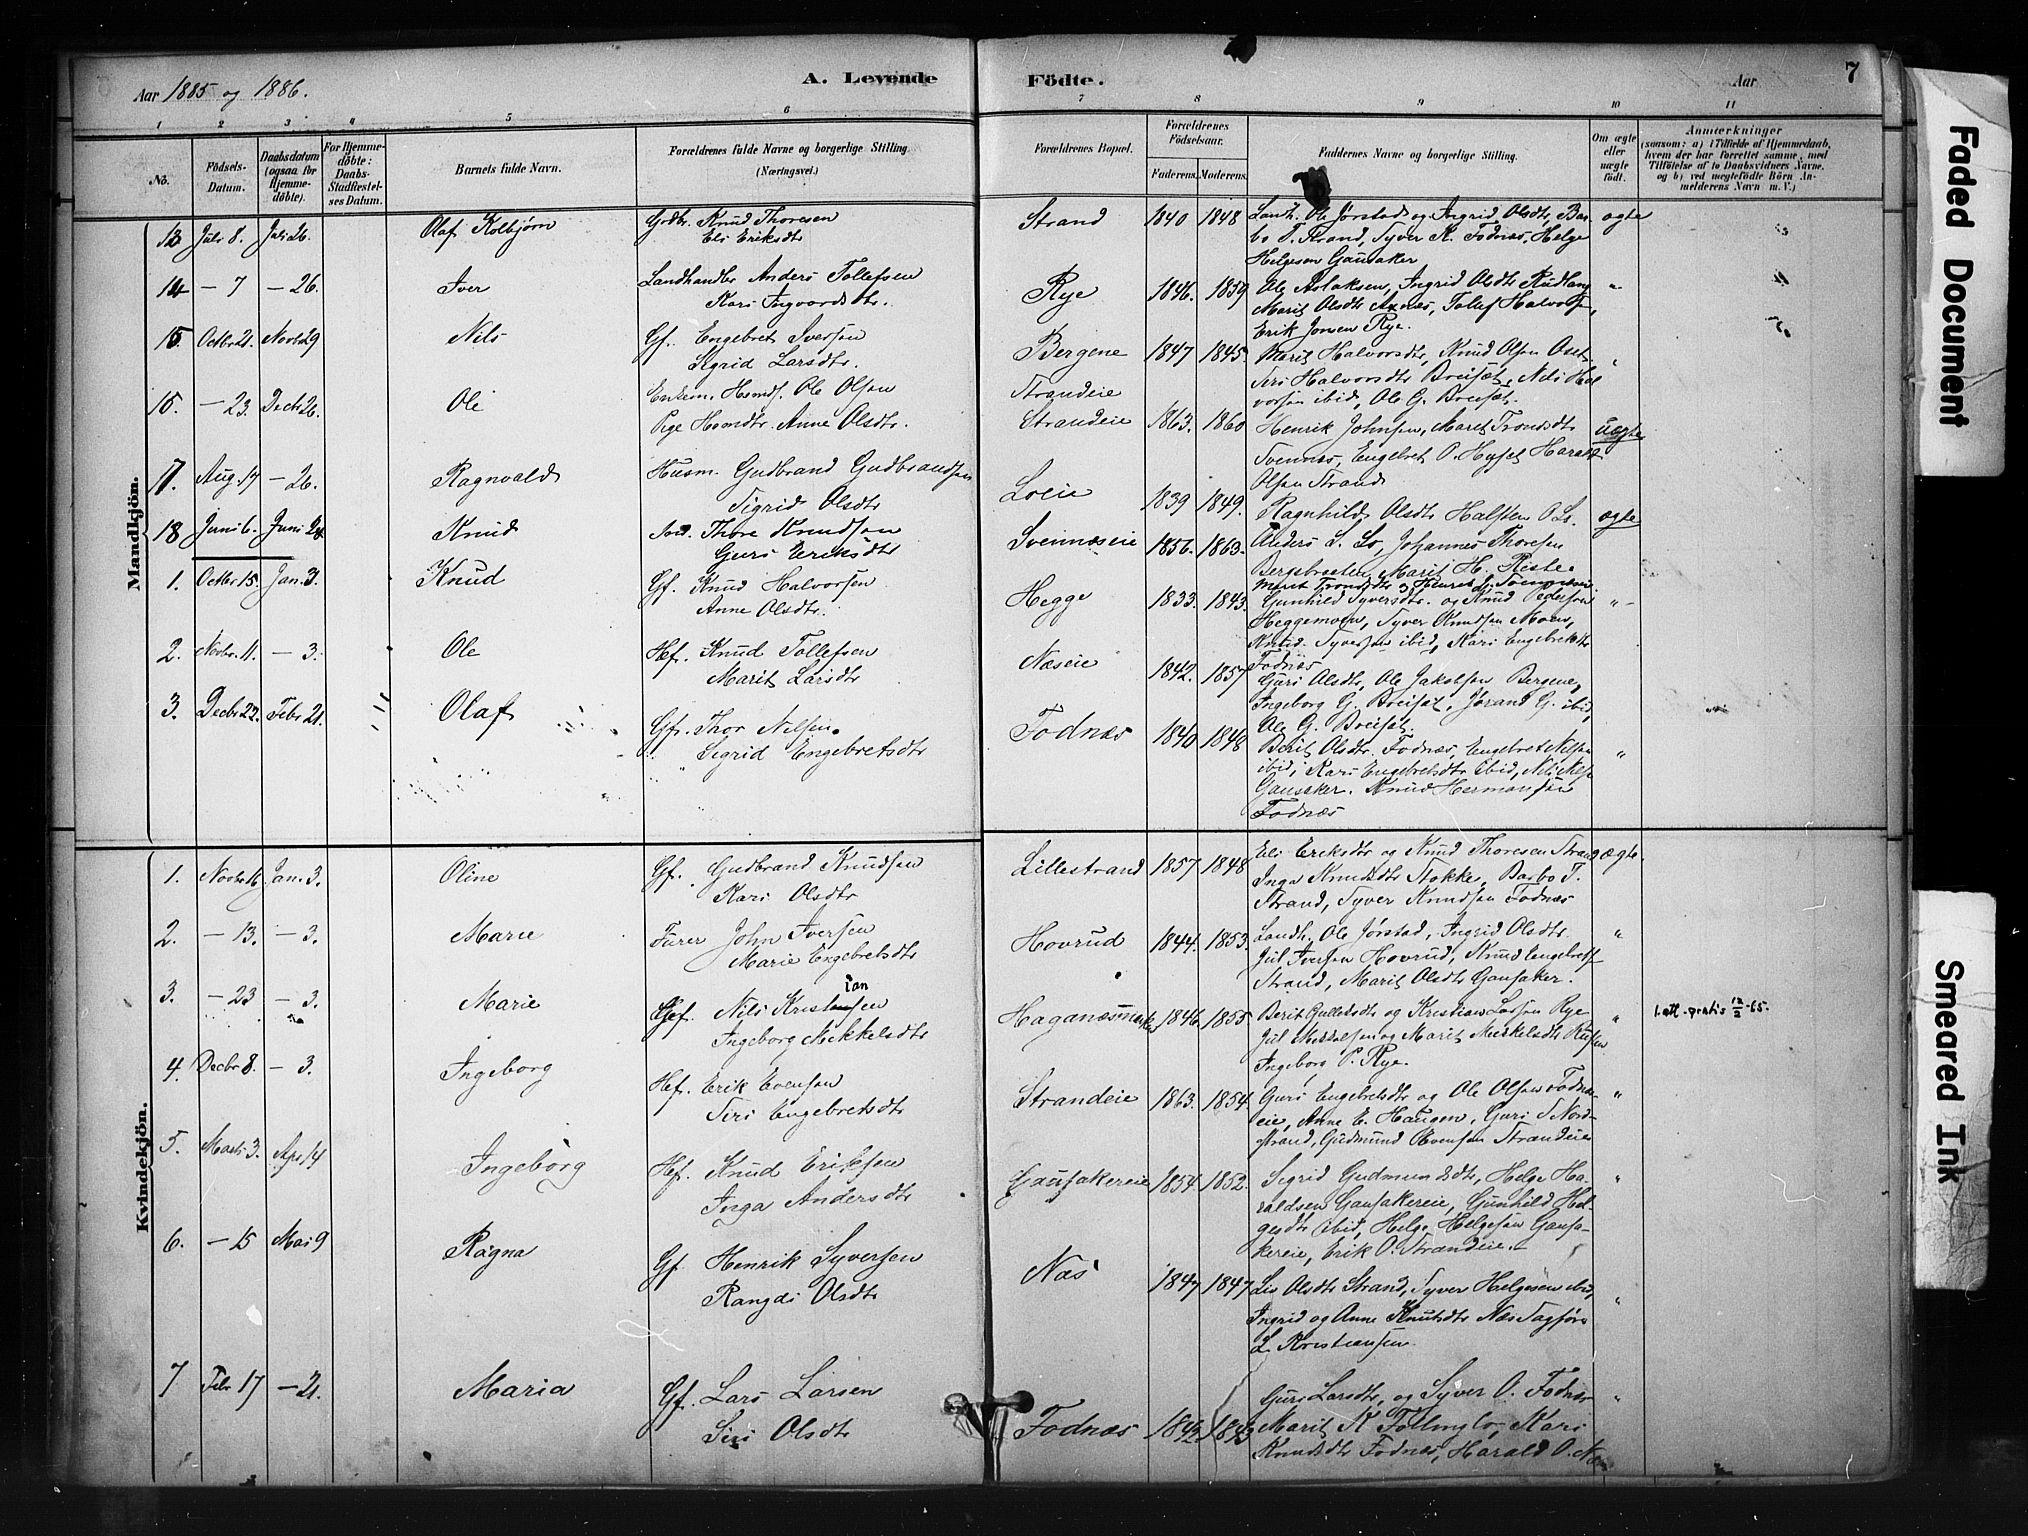 SAH, Nord-Aurdal prestekontor, Ministerialbok nr. 10, 1883-1896, s. 7